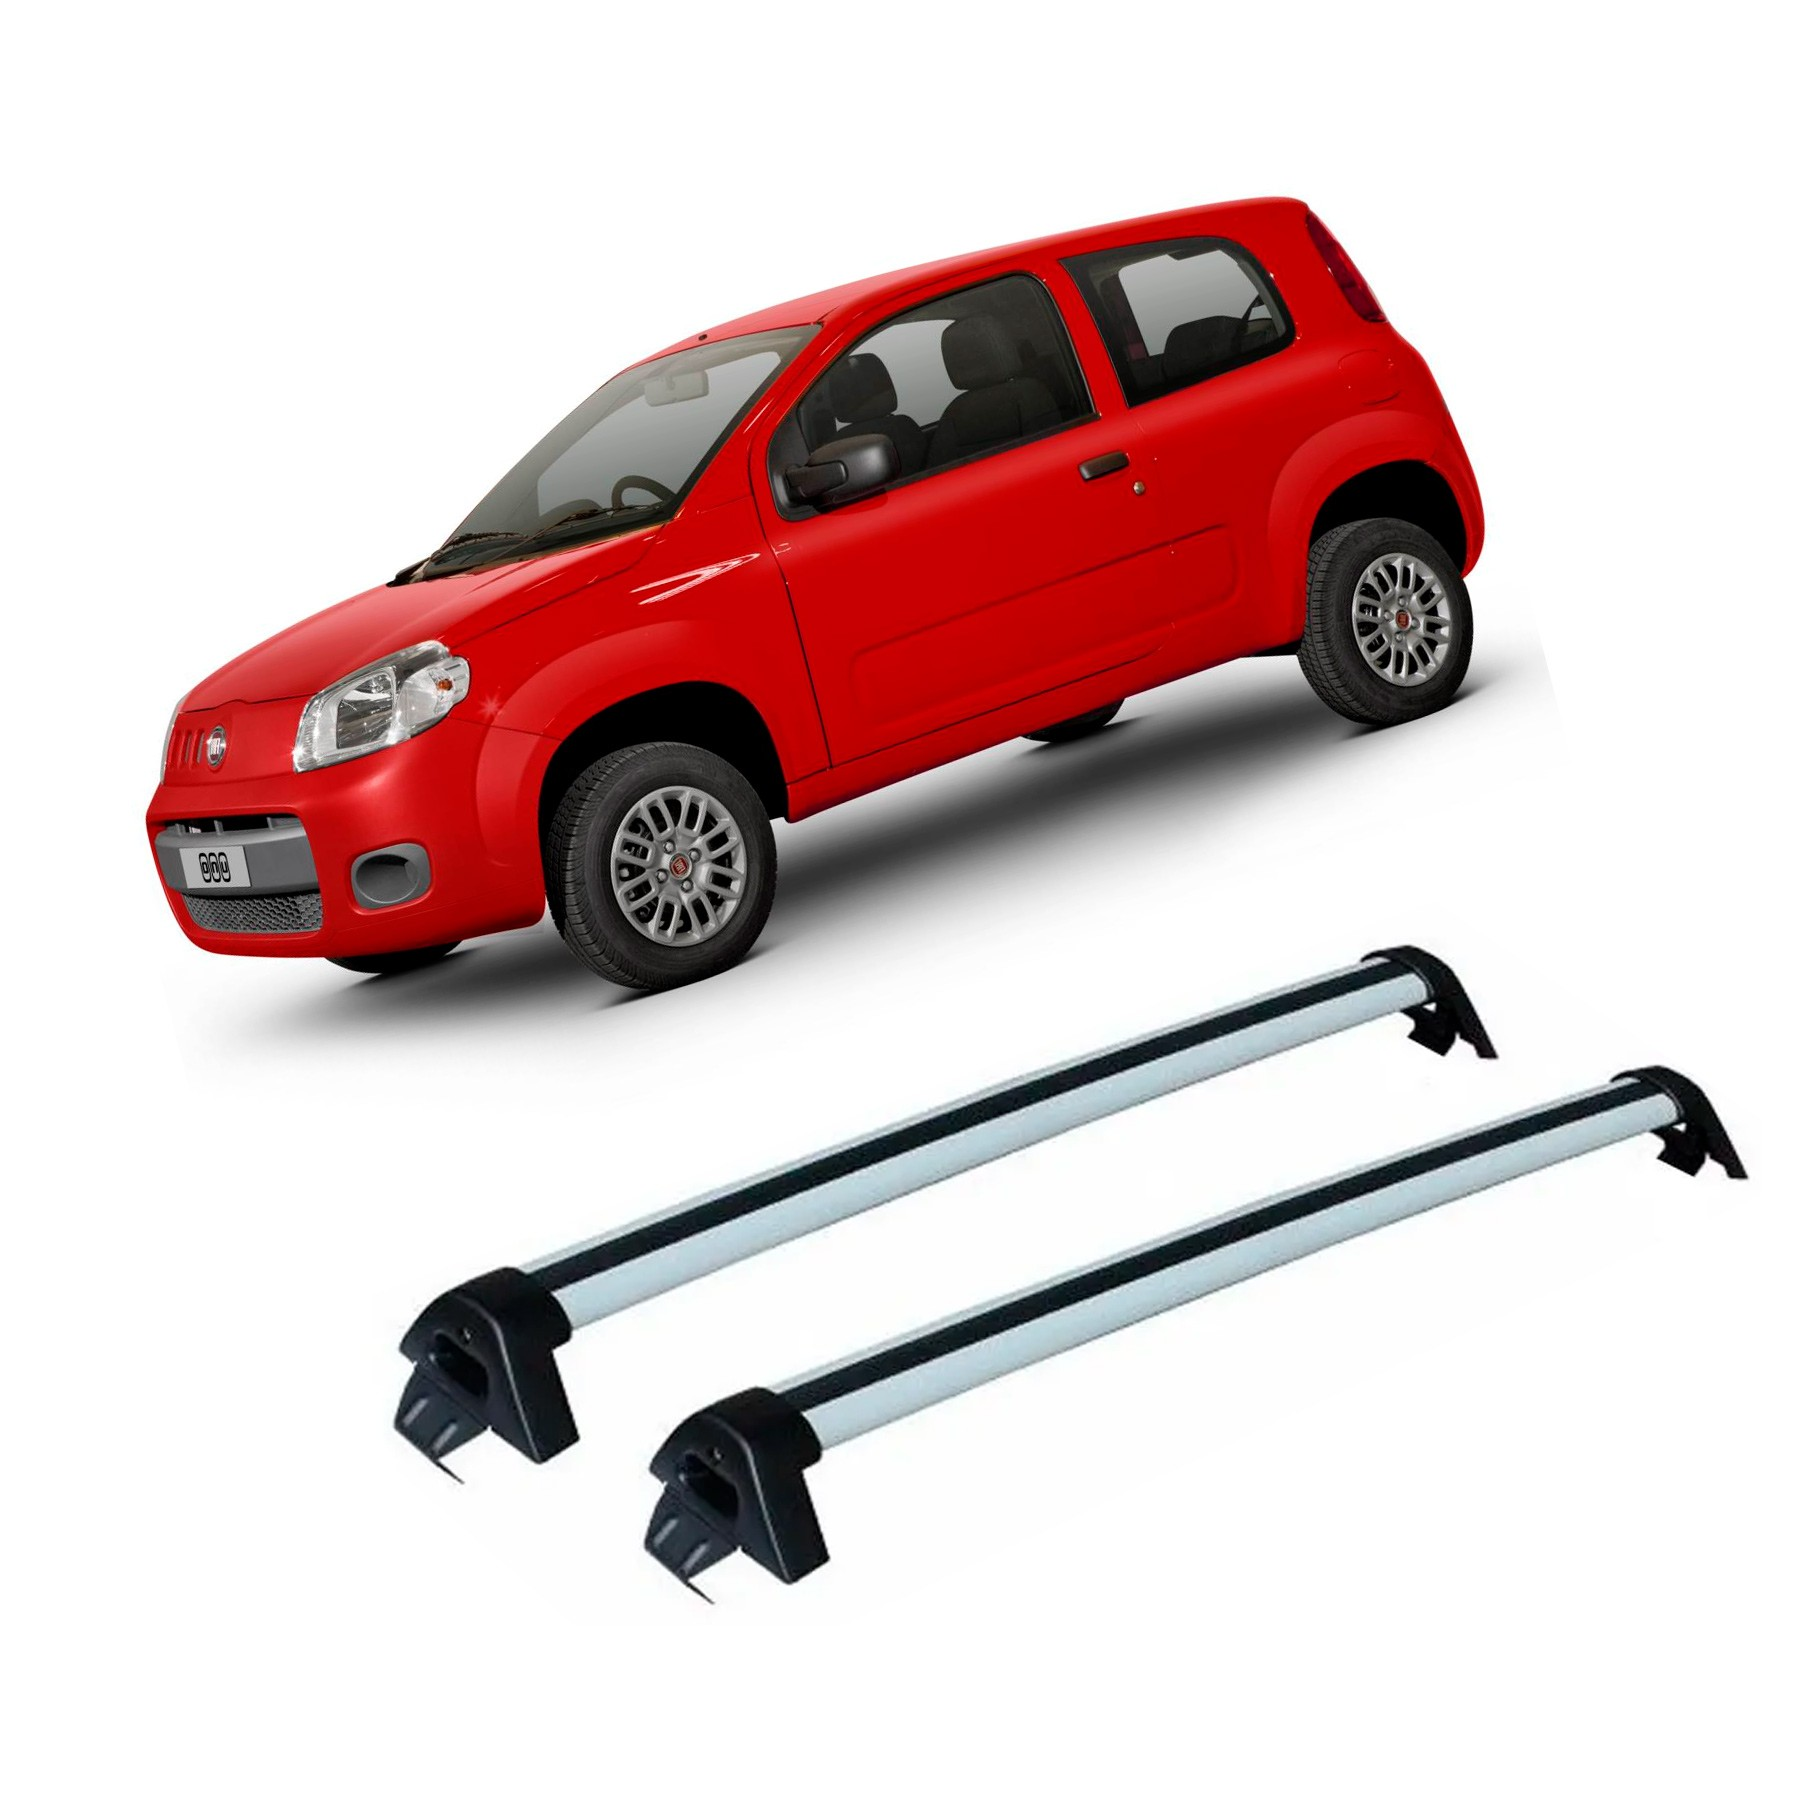 Rack de Teto Travessa Fiat Uno 4 Portas 2010 a 2019 Projecar Carga 45Kg